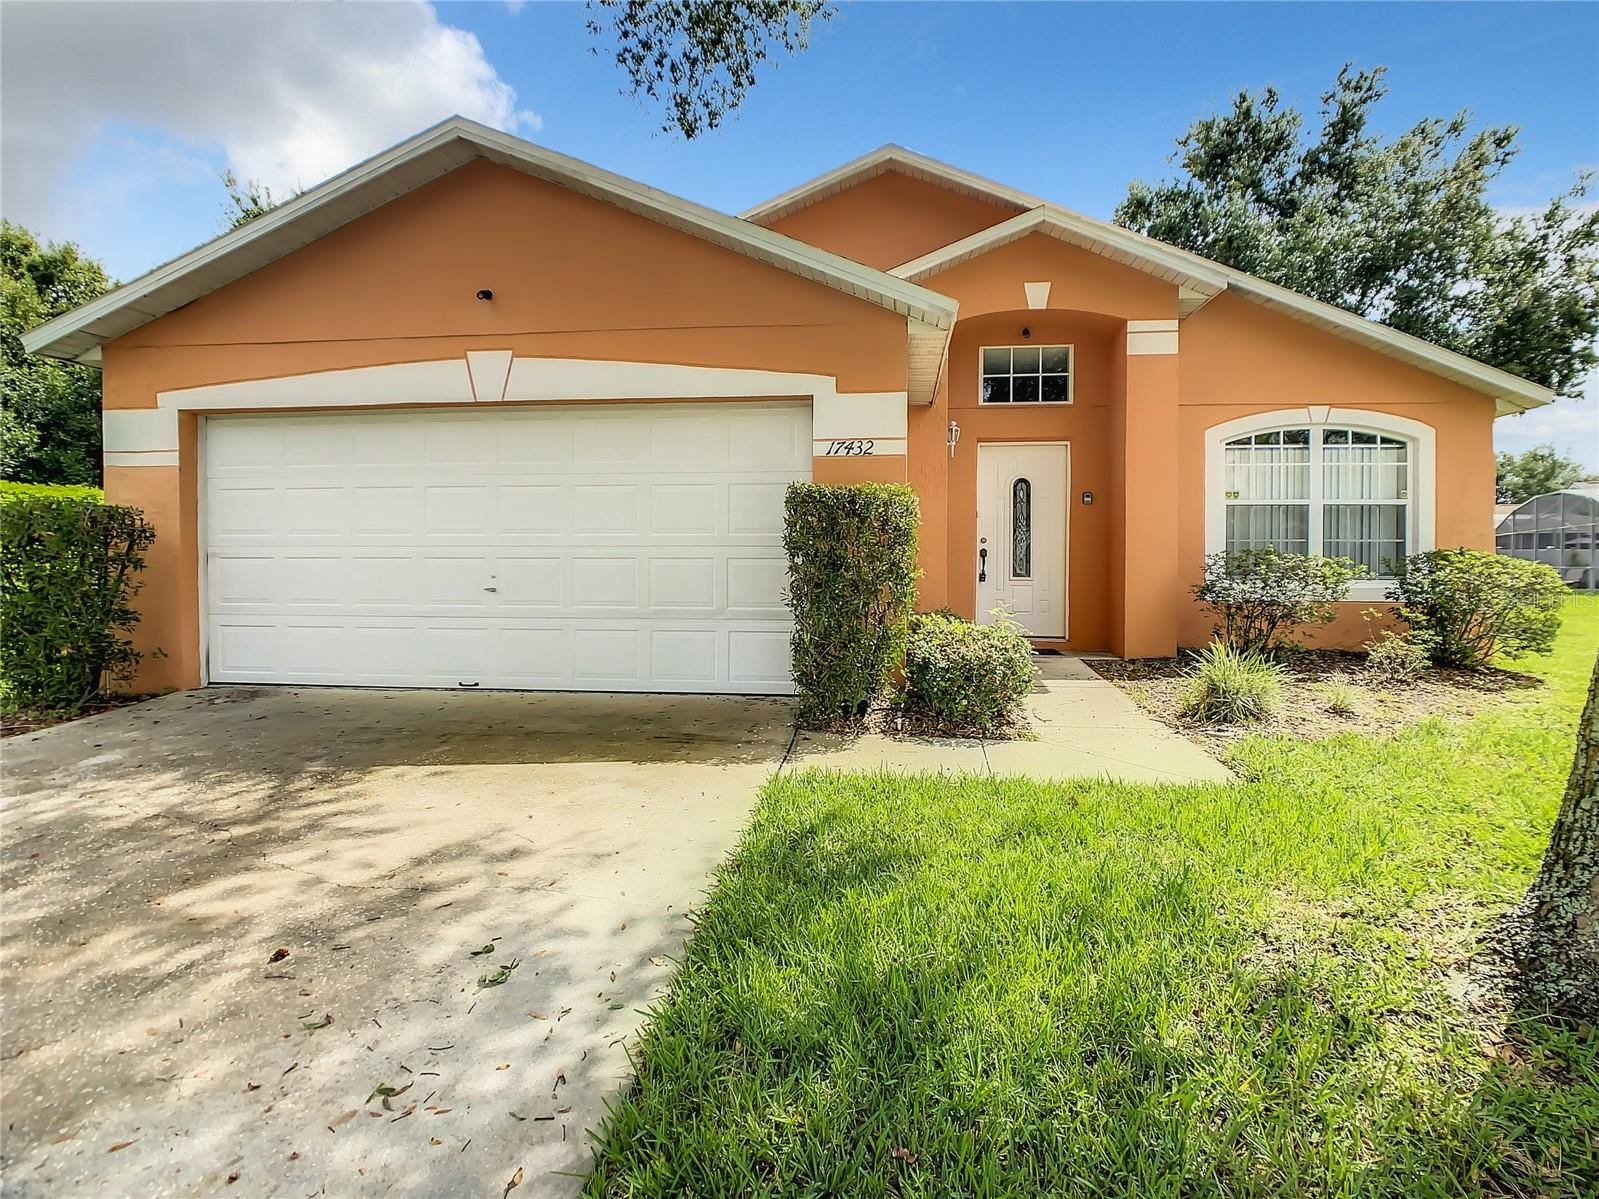 17432 WOODCREST WAY, Clermont, FL 34714 - MLS#: O5974057